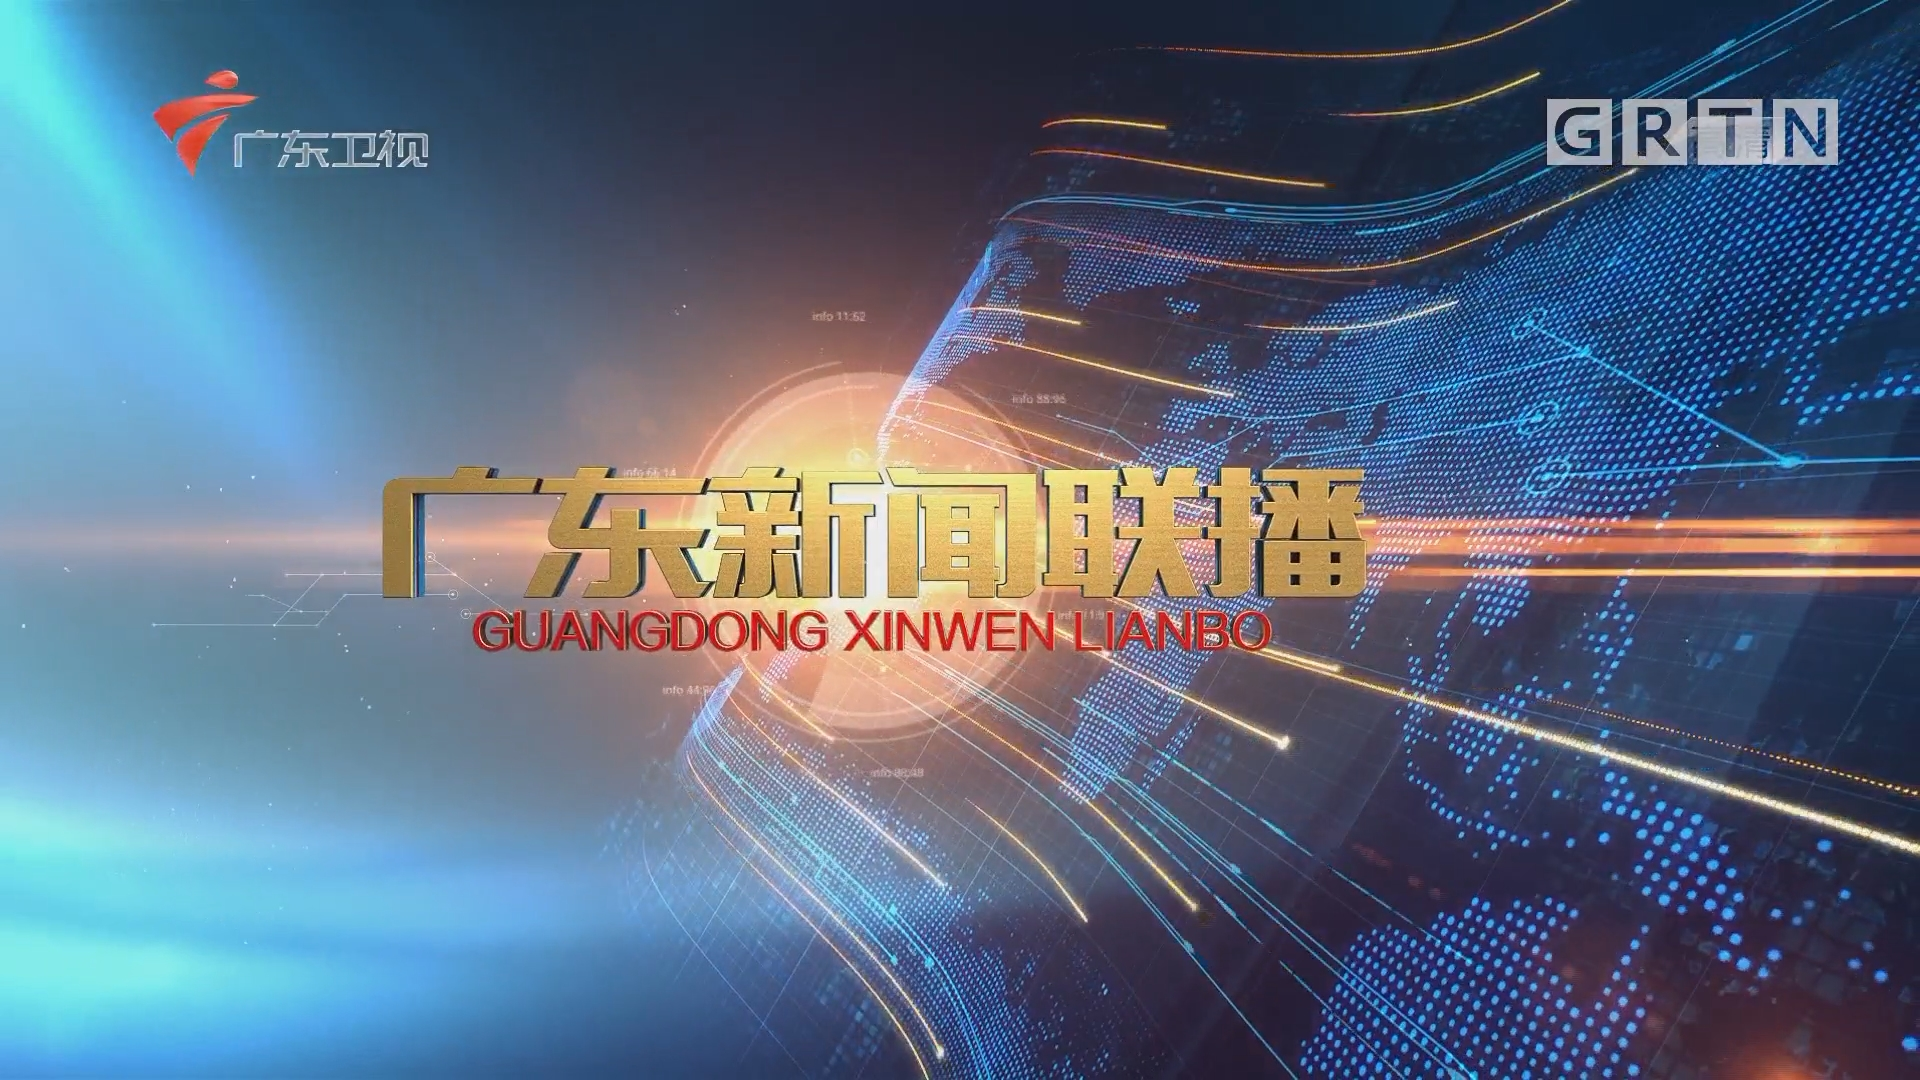 [HD][2018-12-07]广东新闻联播:李希马兴瑞会见新加坡教育部长王乙康